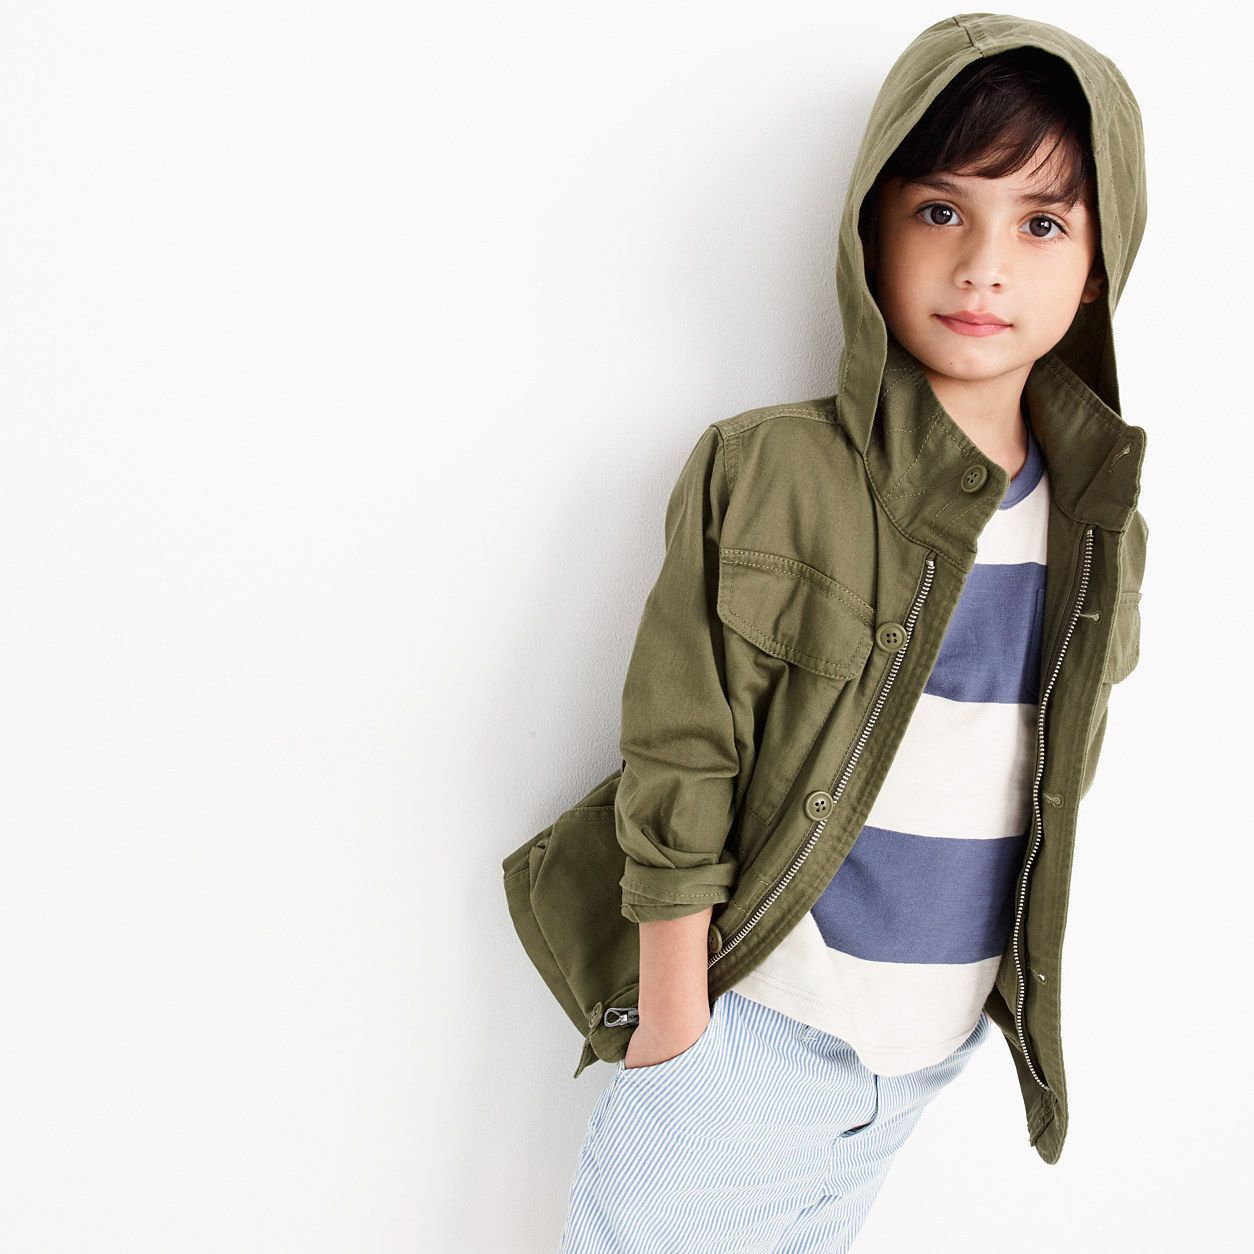 Crewcuts Boys Field Mechanic Jacket Size 6 7 Kid Clothes Kids Outerwear Boy Outerwear [ 1254 x 1254 Pixel ]